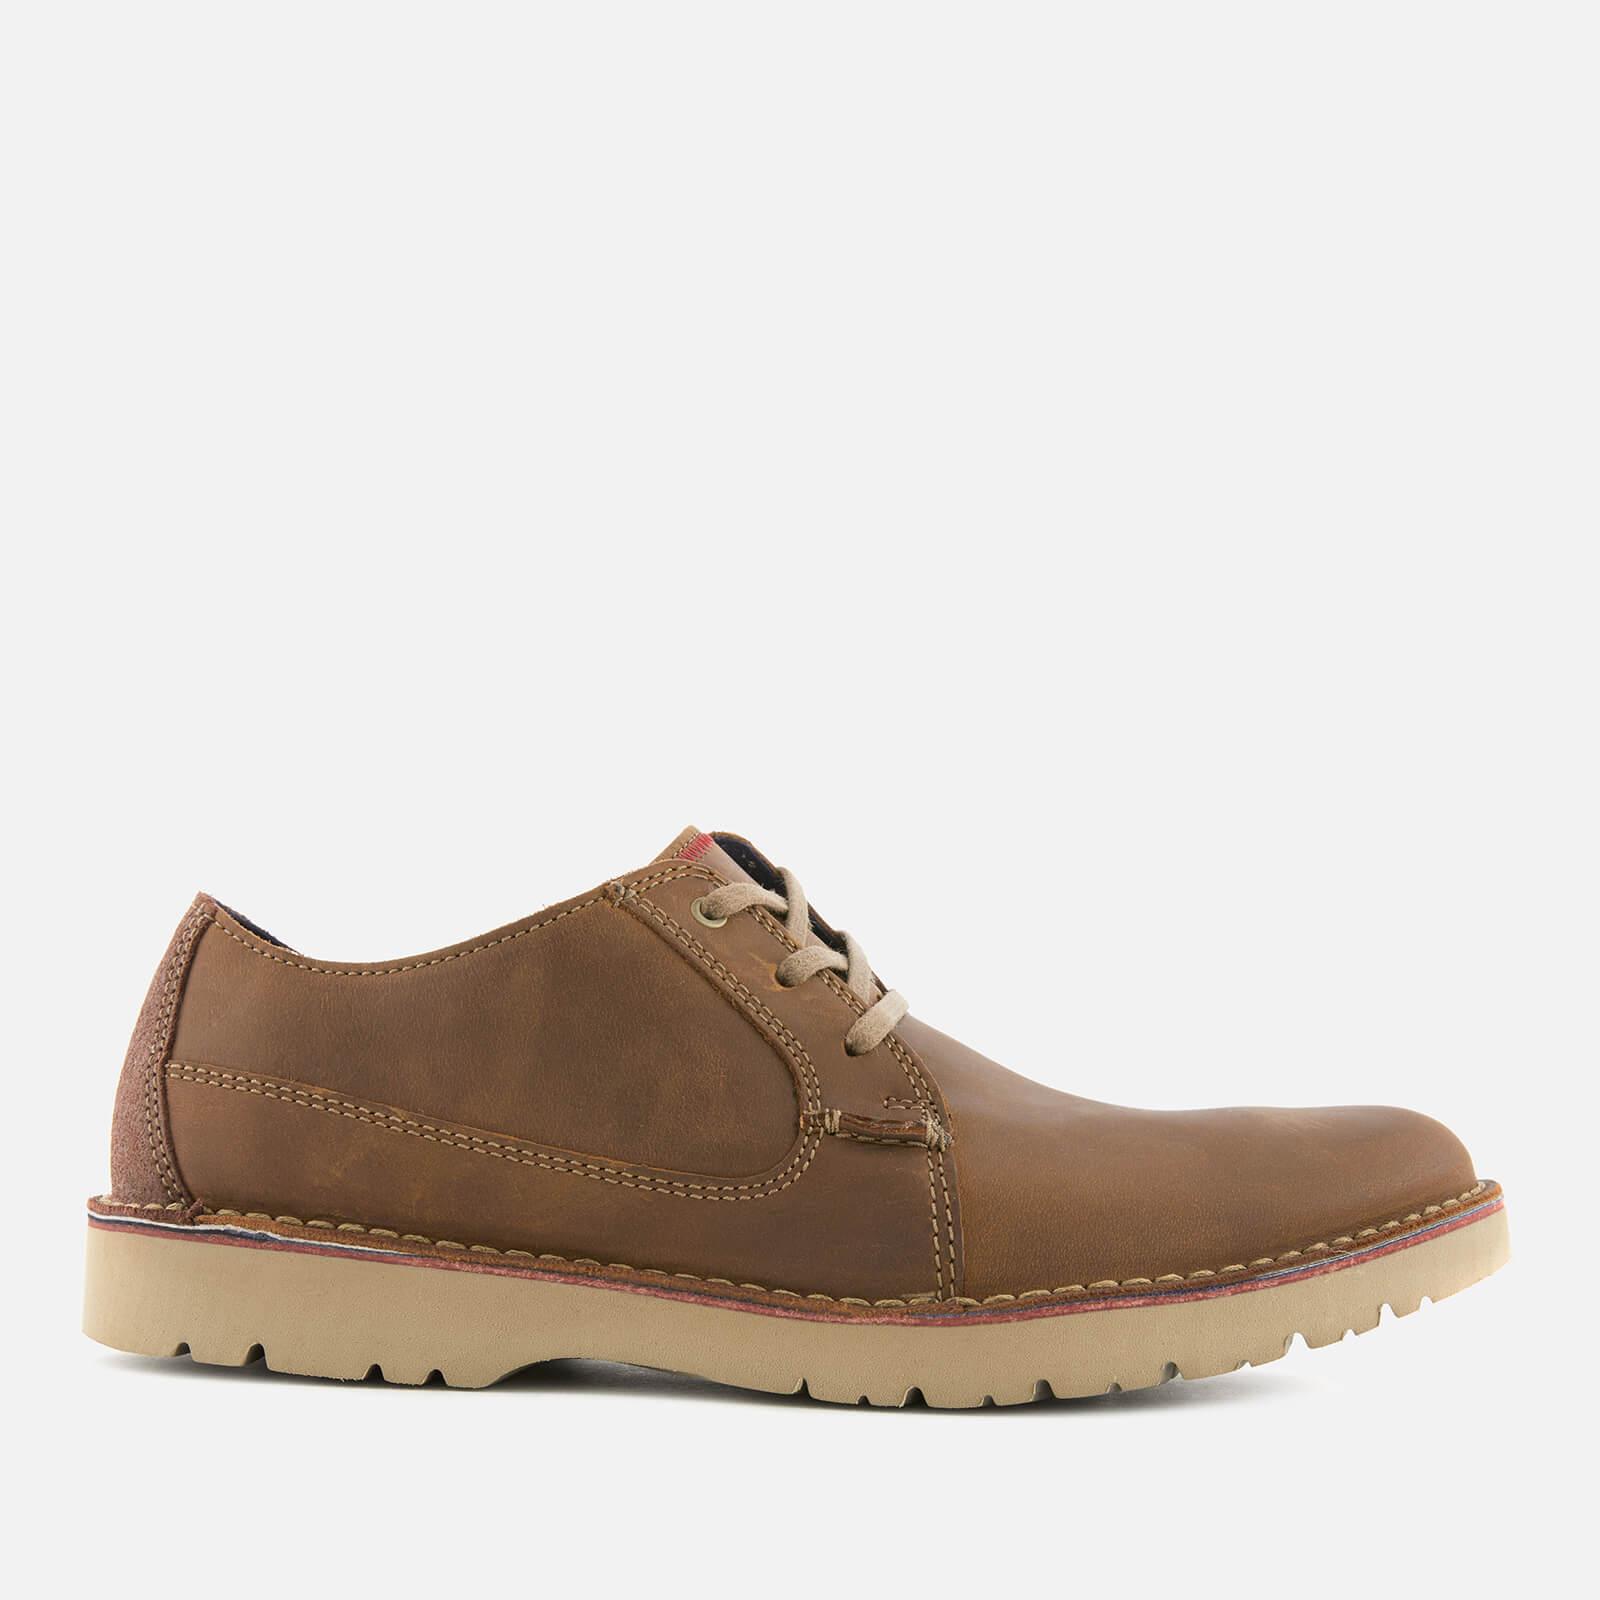 Clarks Men's Vargo Plain Leather Derby Shoes - Dark Tan - UK 7